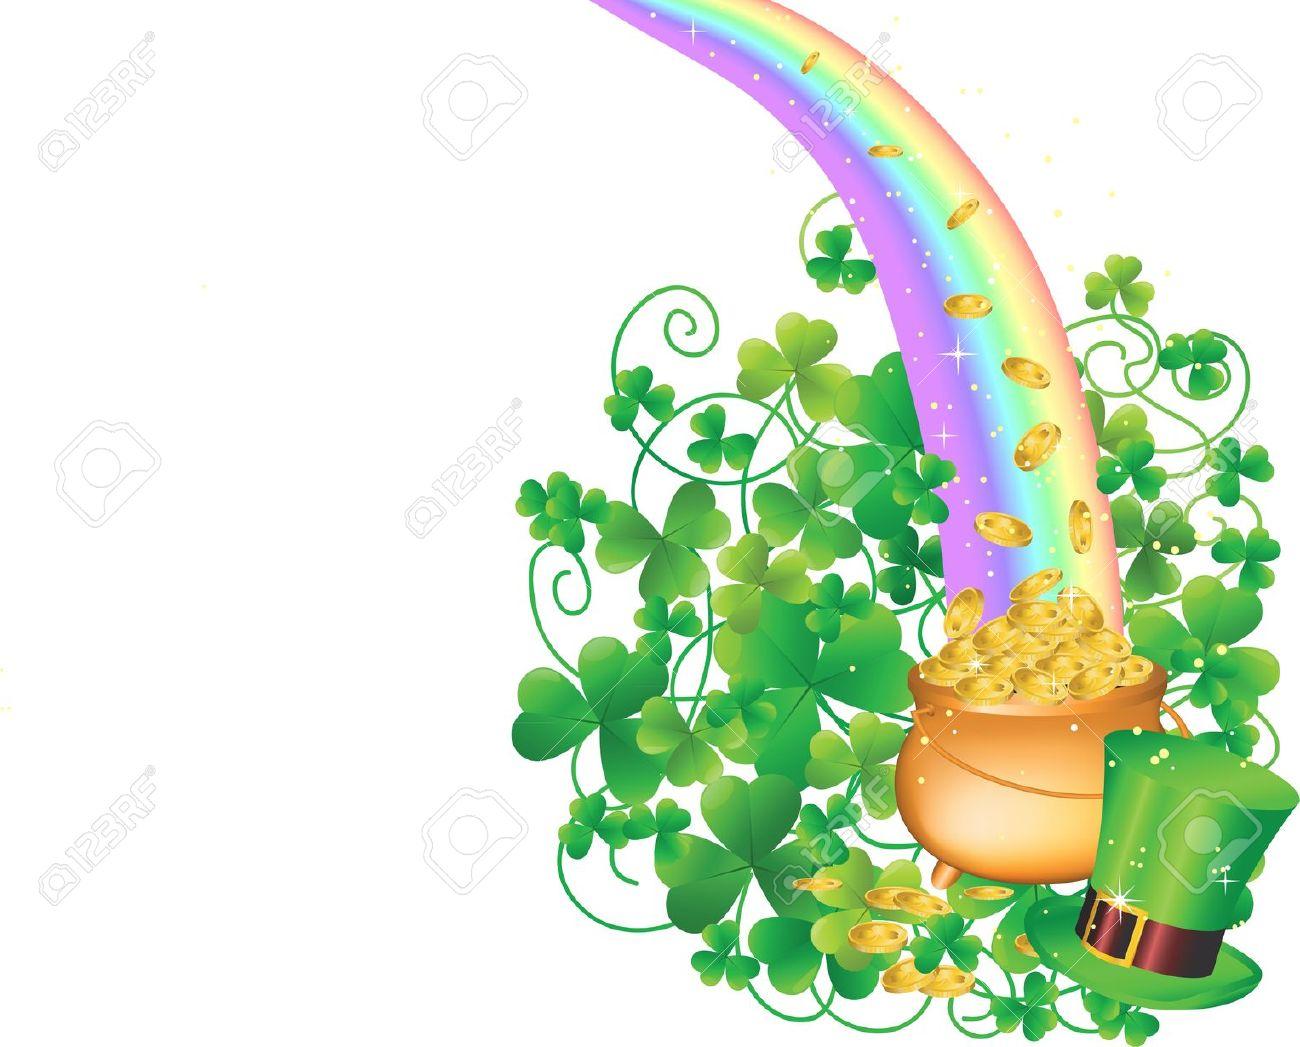 Green plant rainbow clipart - Clipground